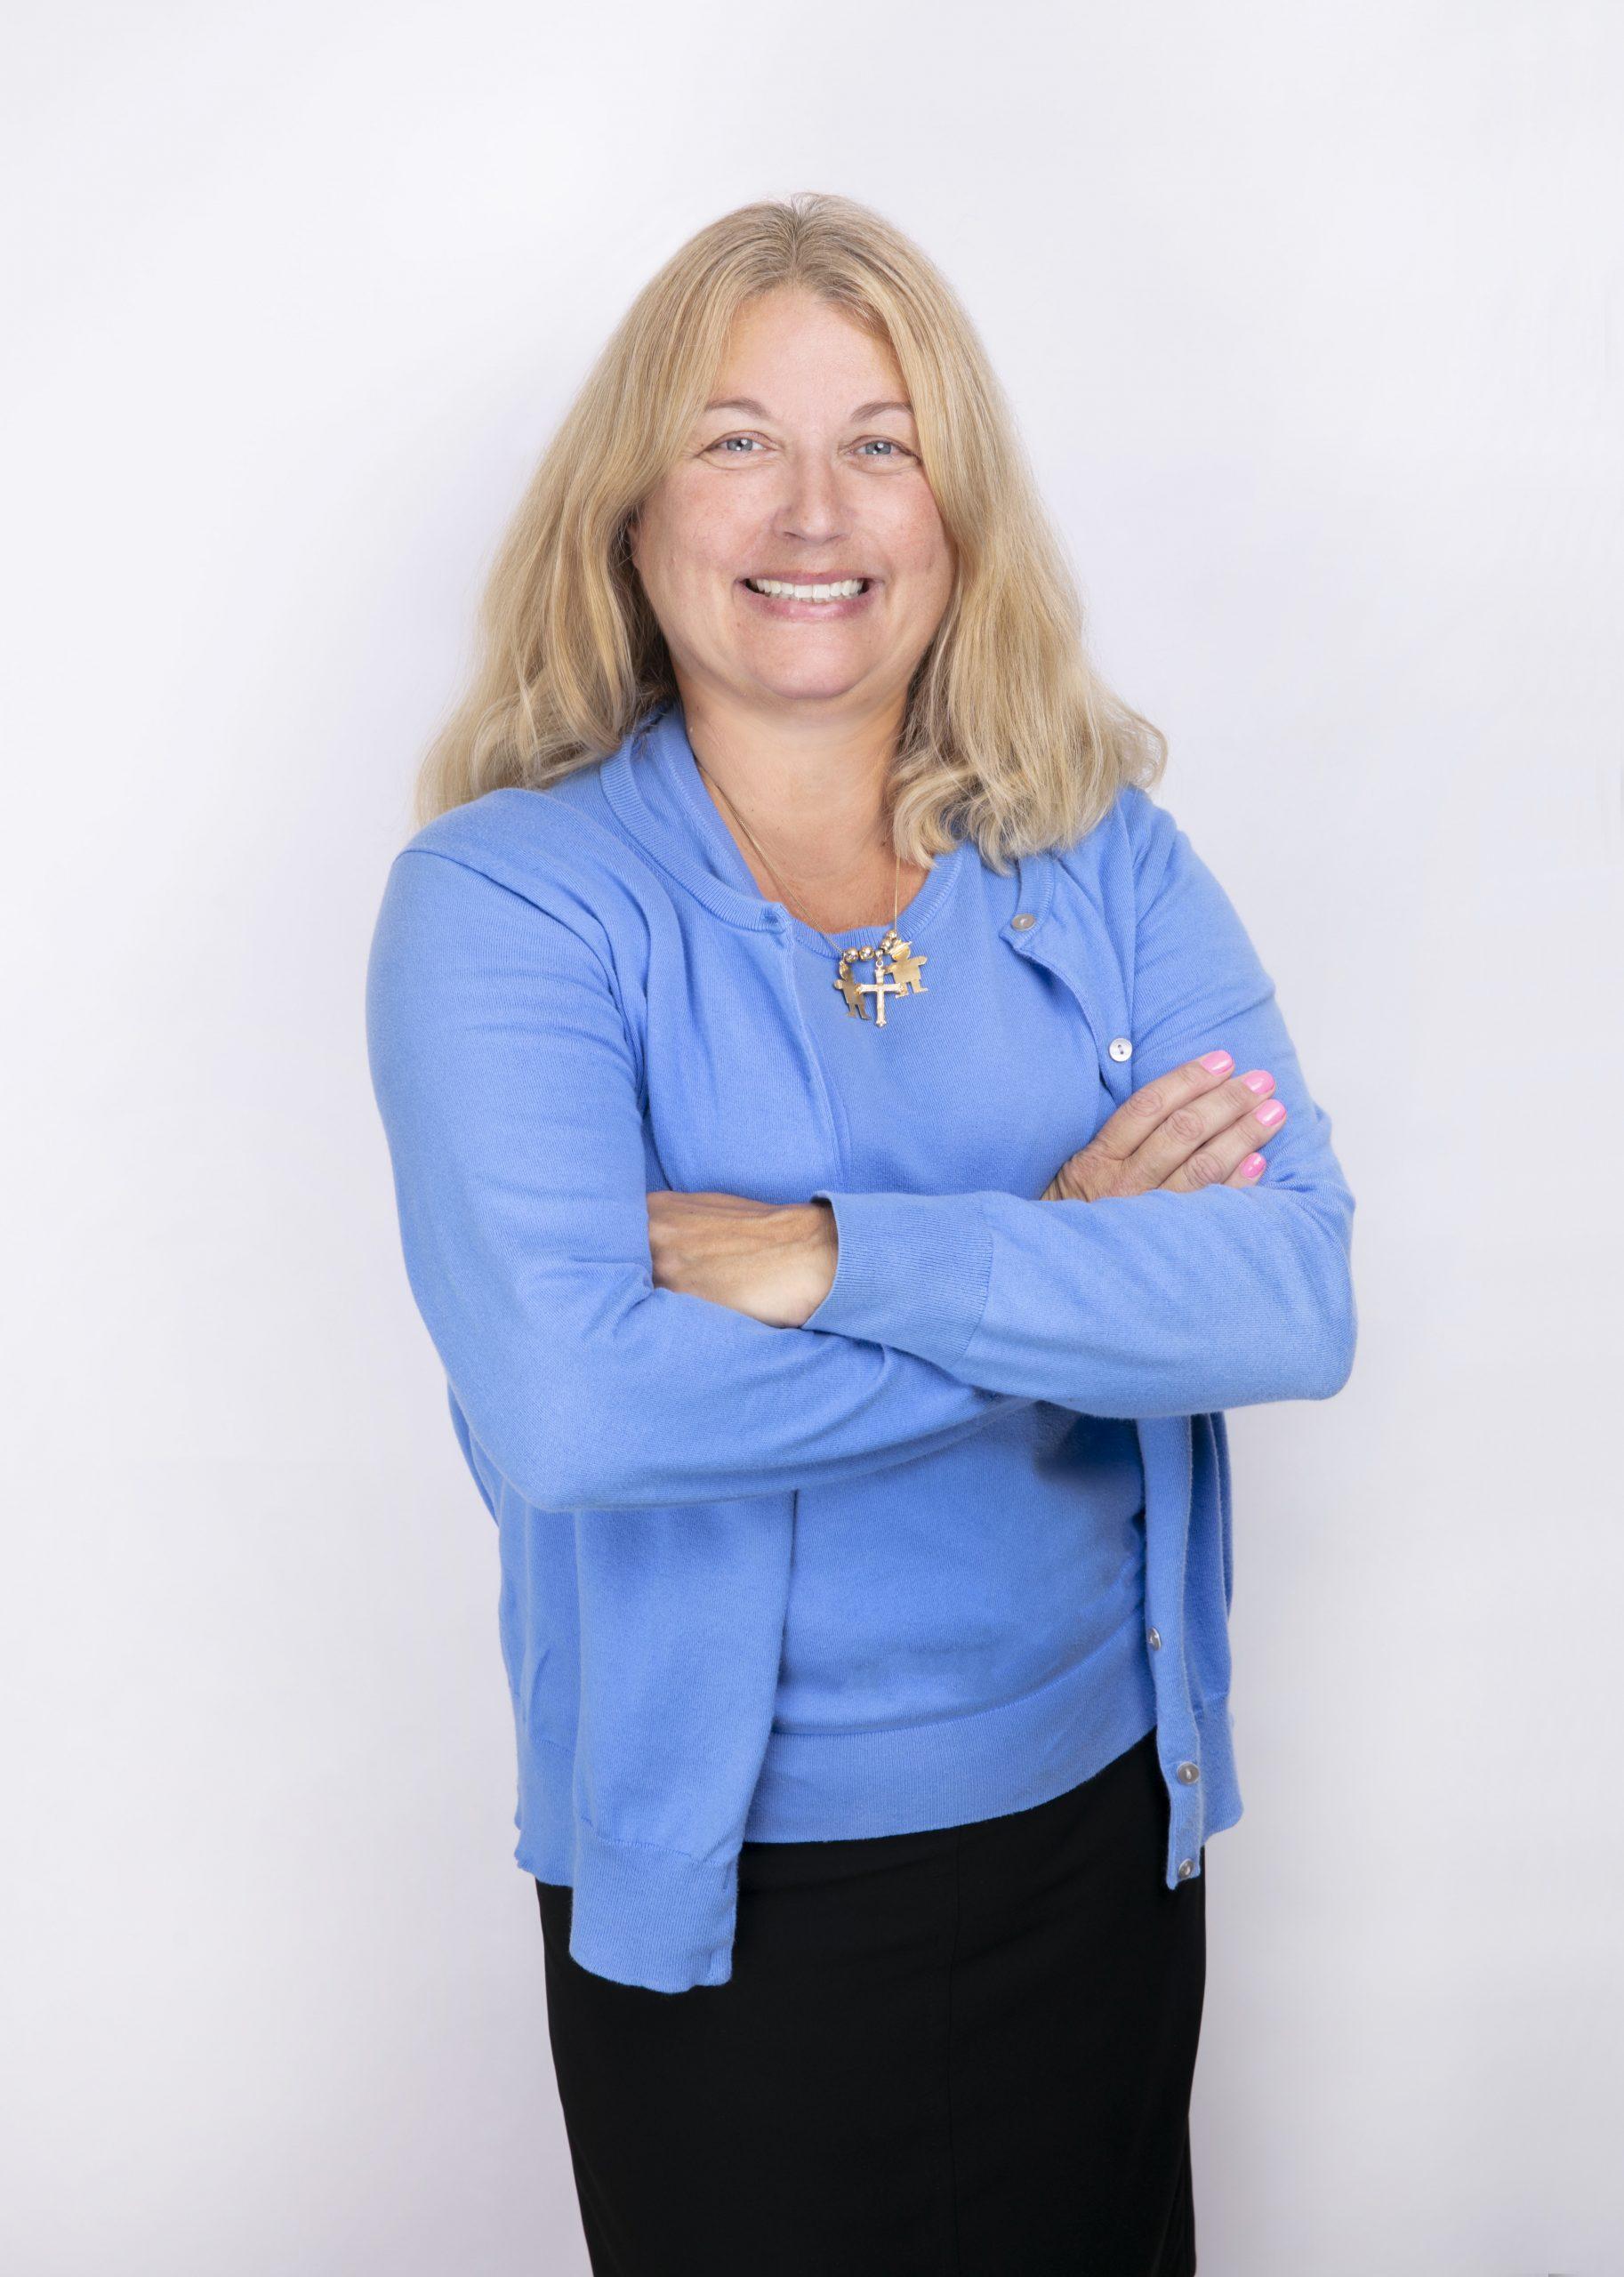 Nina Cavalli, MD, FAAP